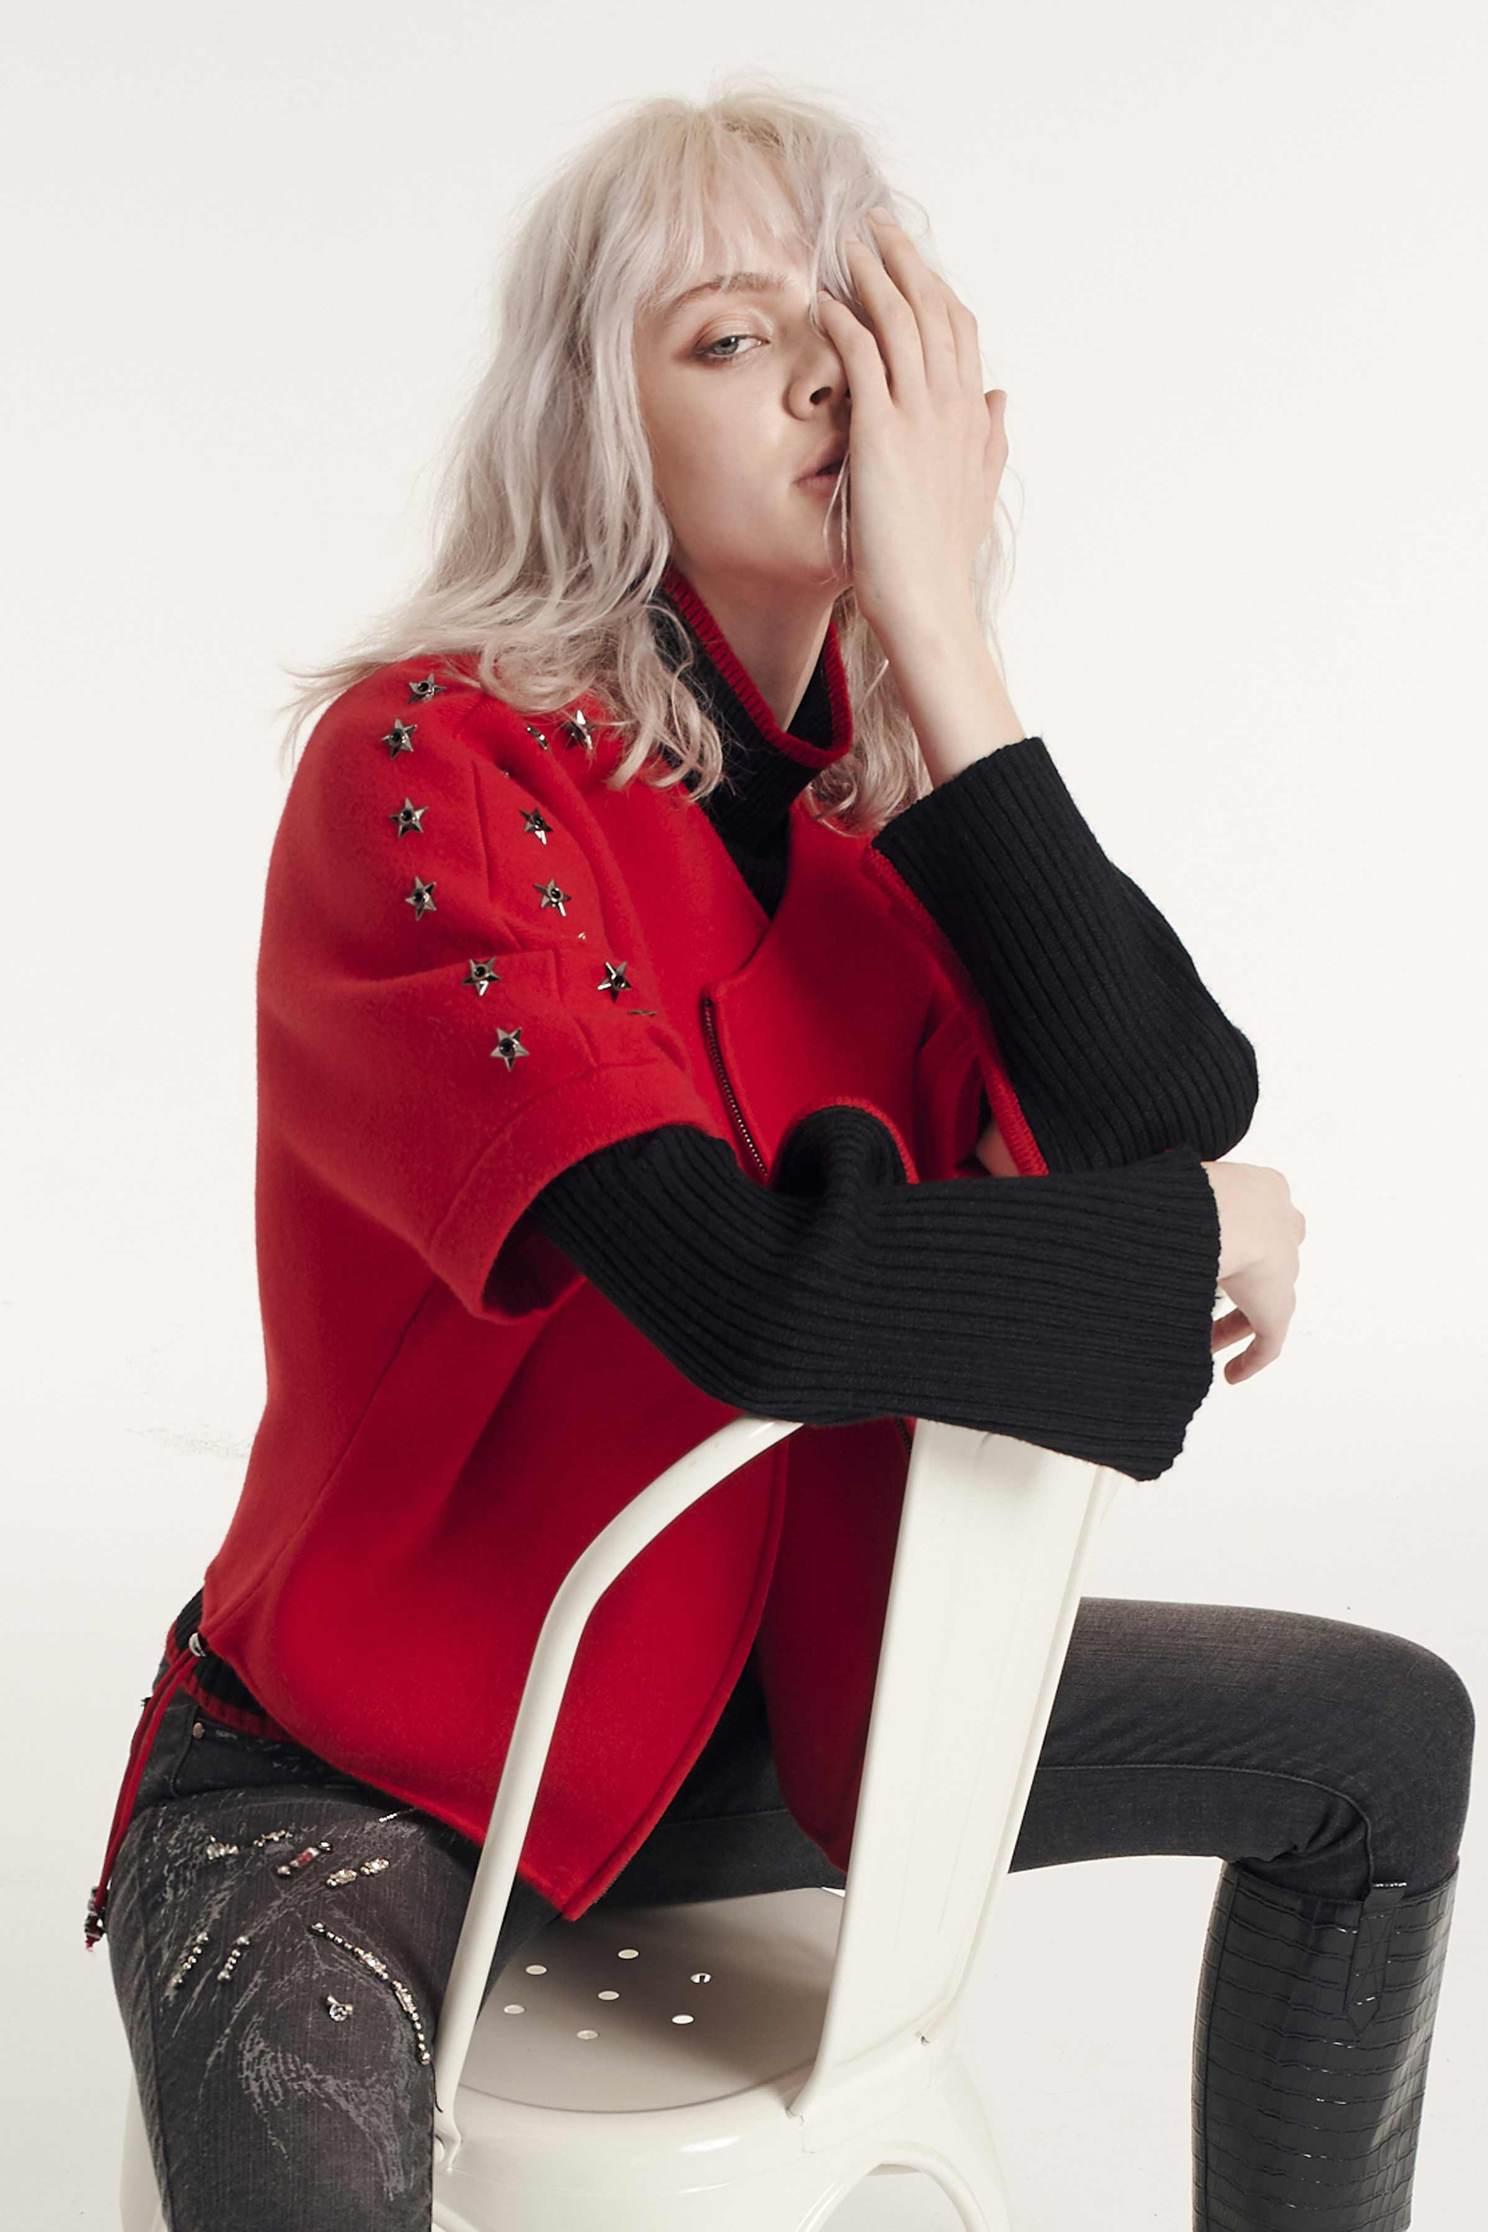 High-necked croisser knitwear,newyearred,knitting,knittedtop,knittedtop,longsleevetop,turtlenecktop,blacktop